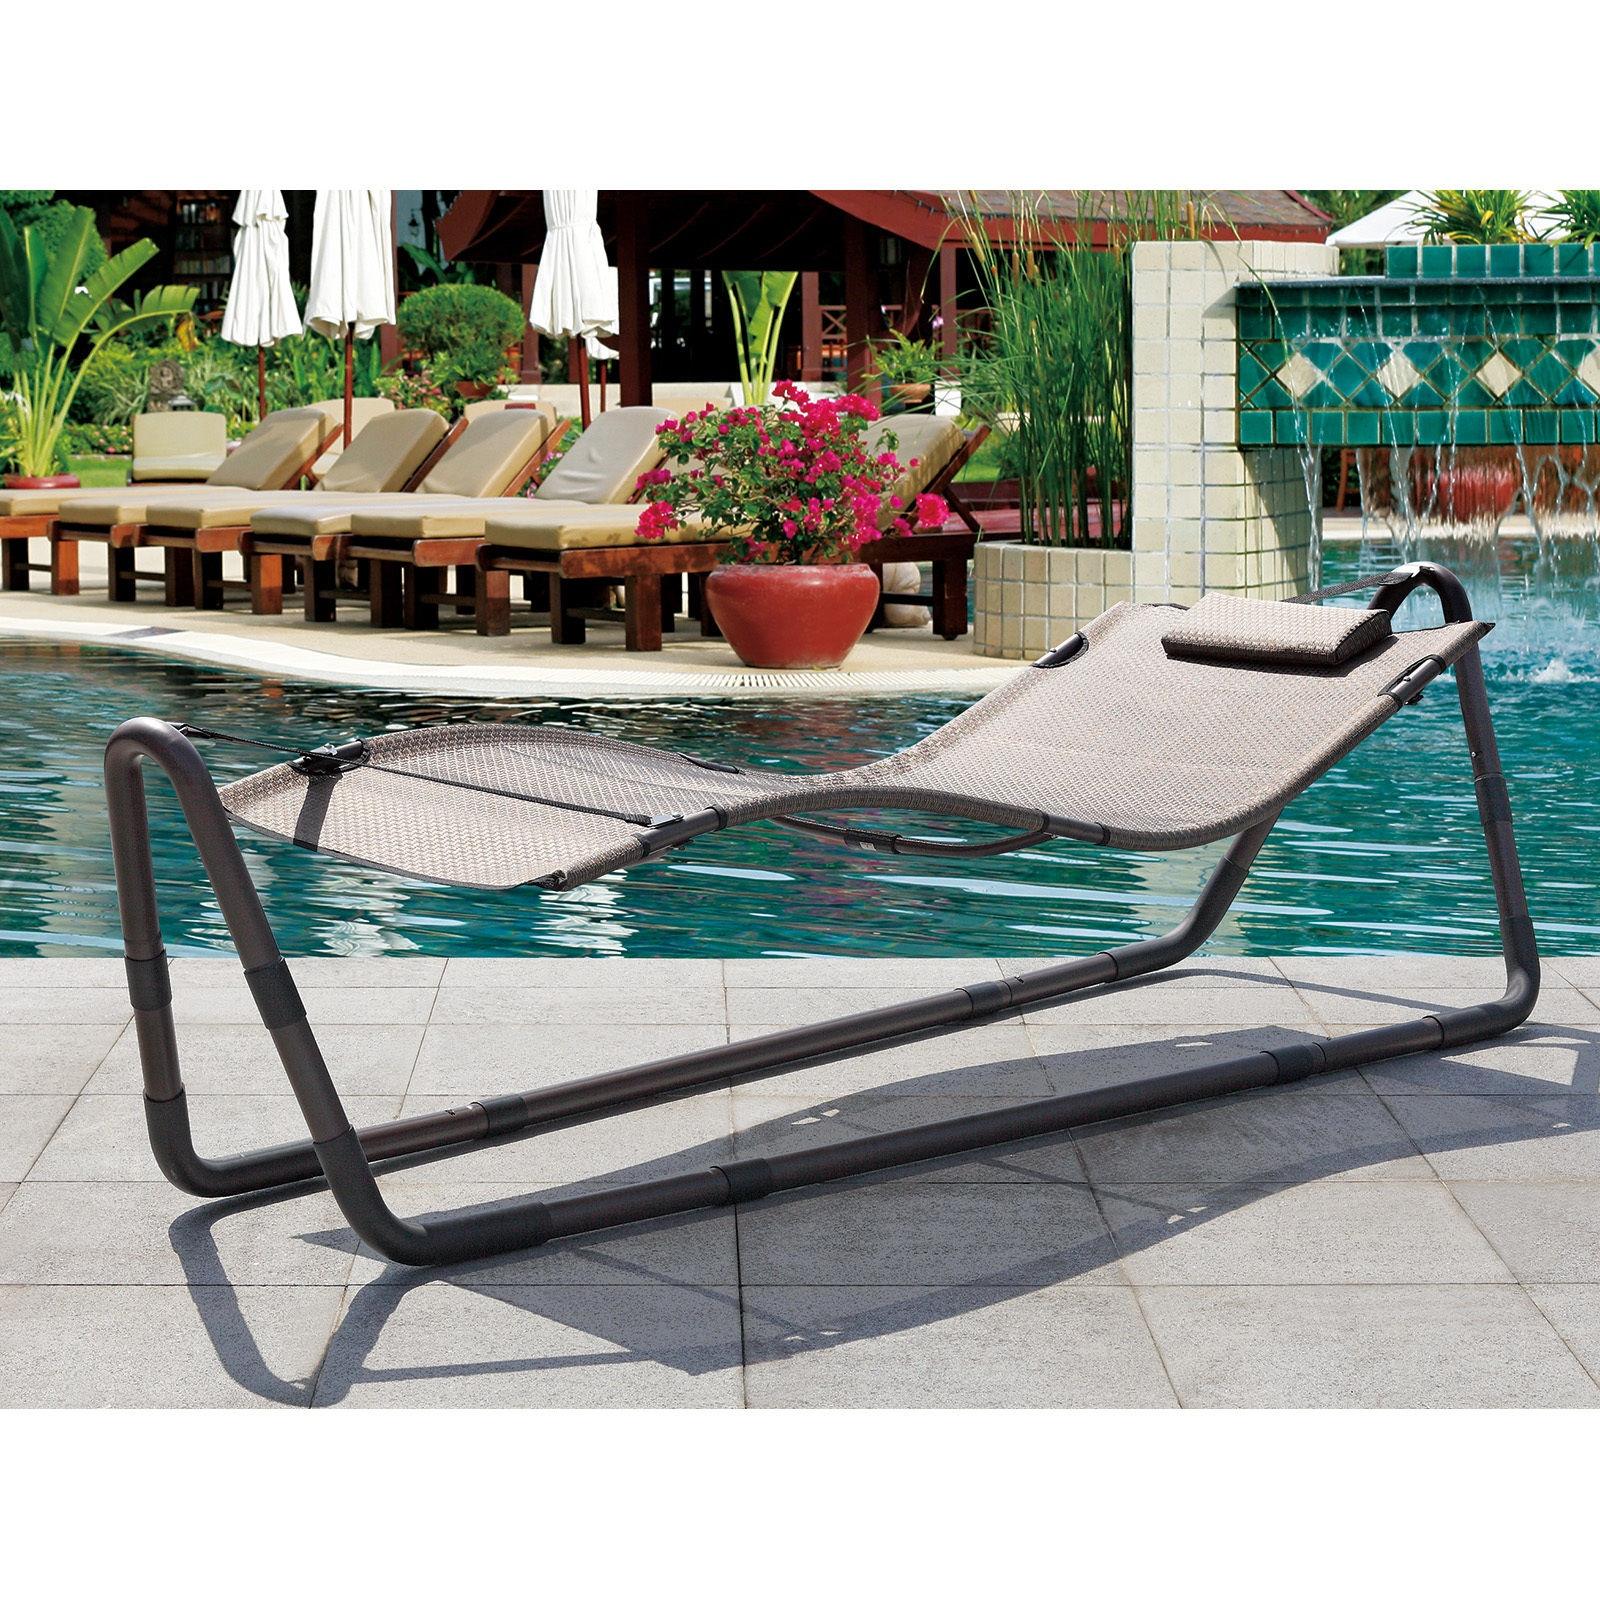 Modern Outdoor Patio Hammock Sun Bed Deck Pool Lounge Chair